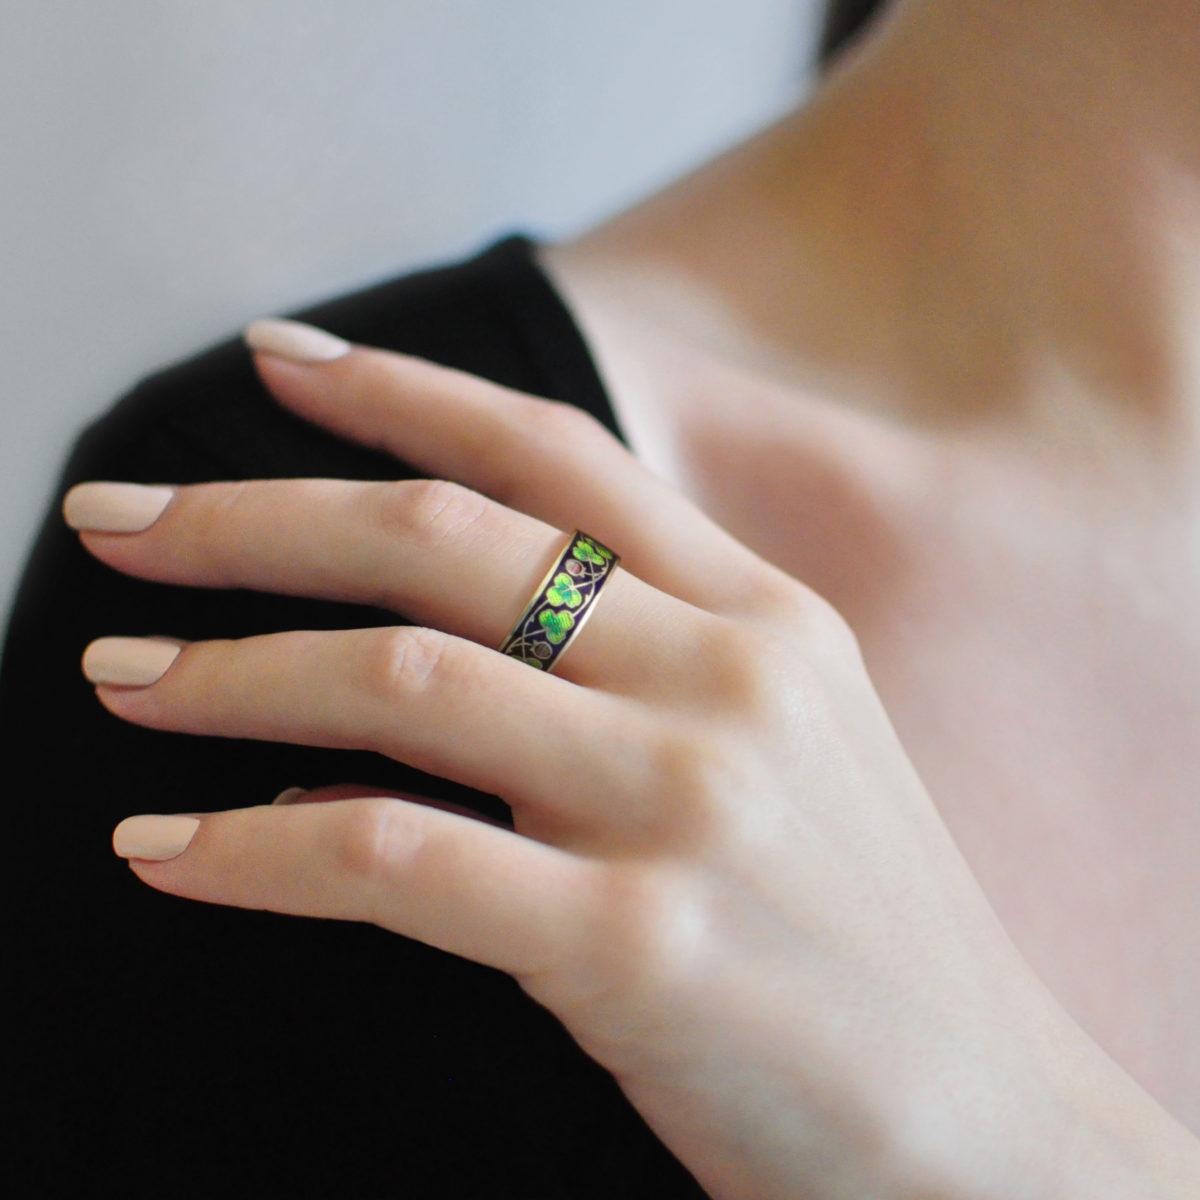 Serebro s zelenym 1200x1200 - Кольцо «Спас-на-крови», зеленая